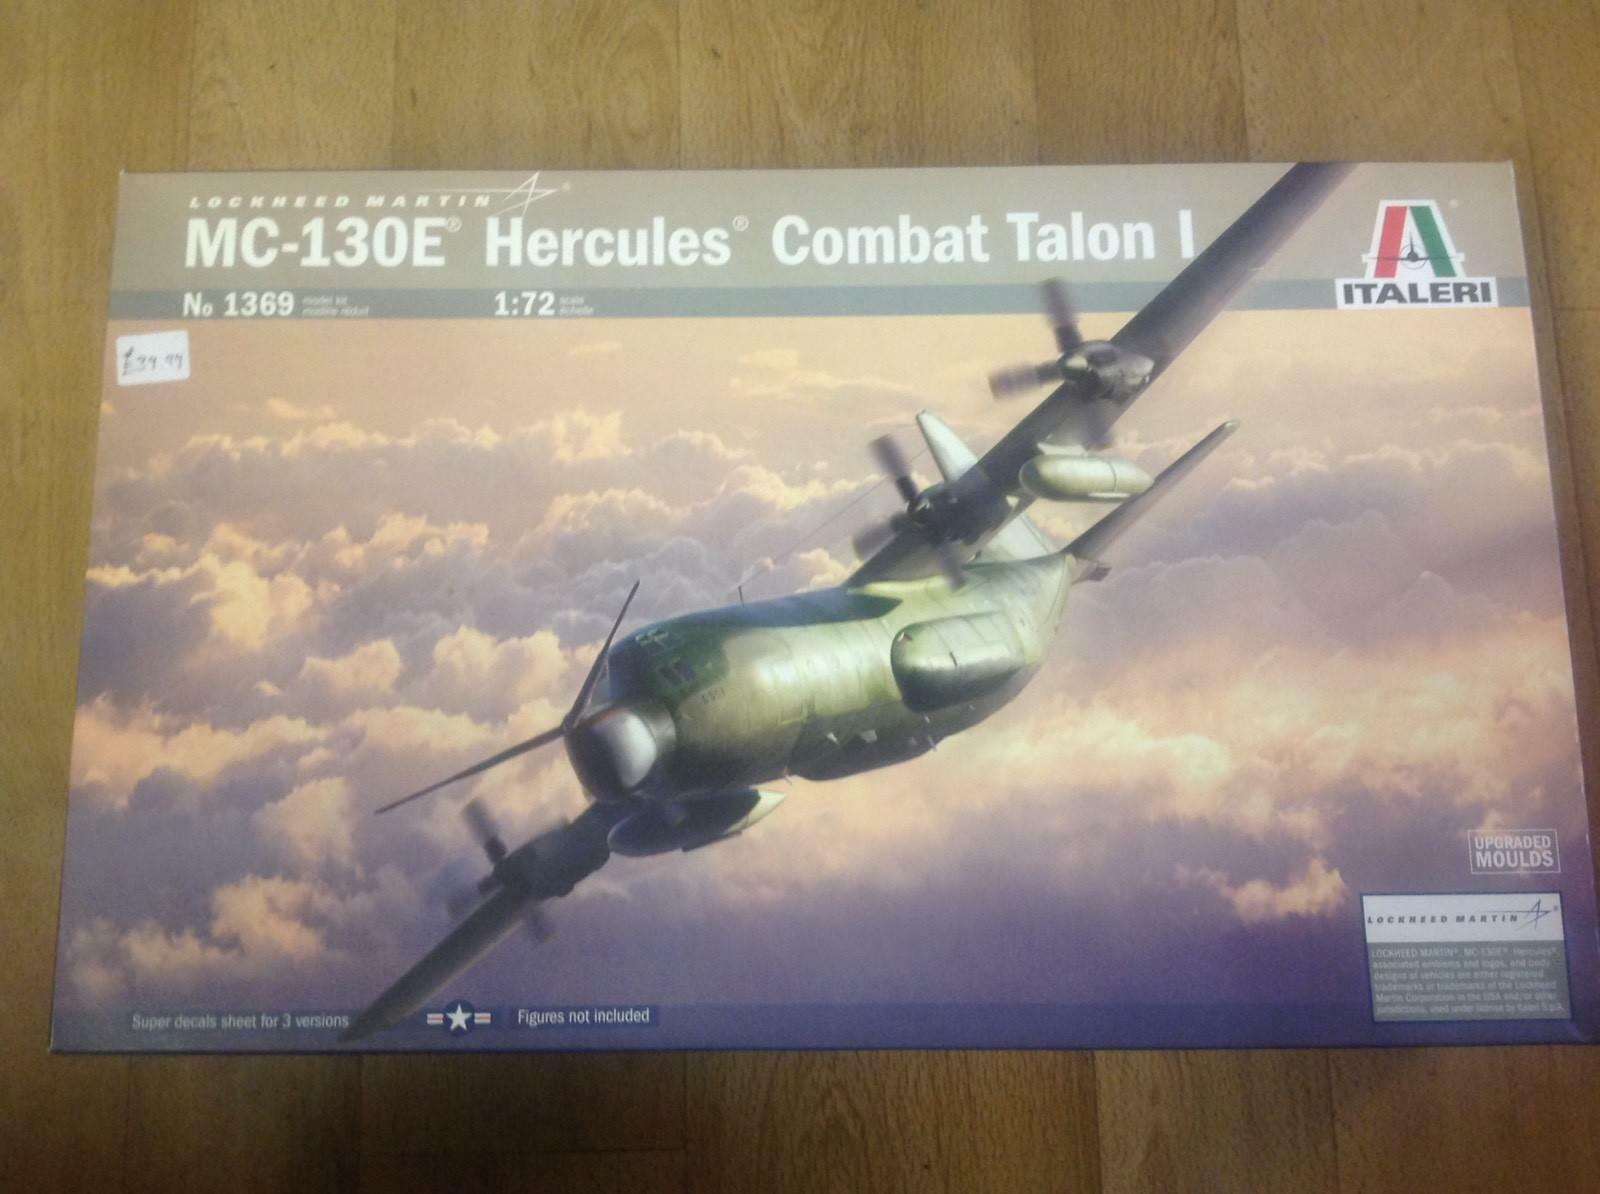 Italeri 1369 MC-130E Hercules Combat Talon 1 1 72 Scale